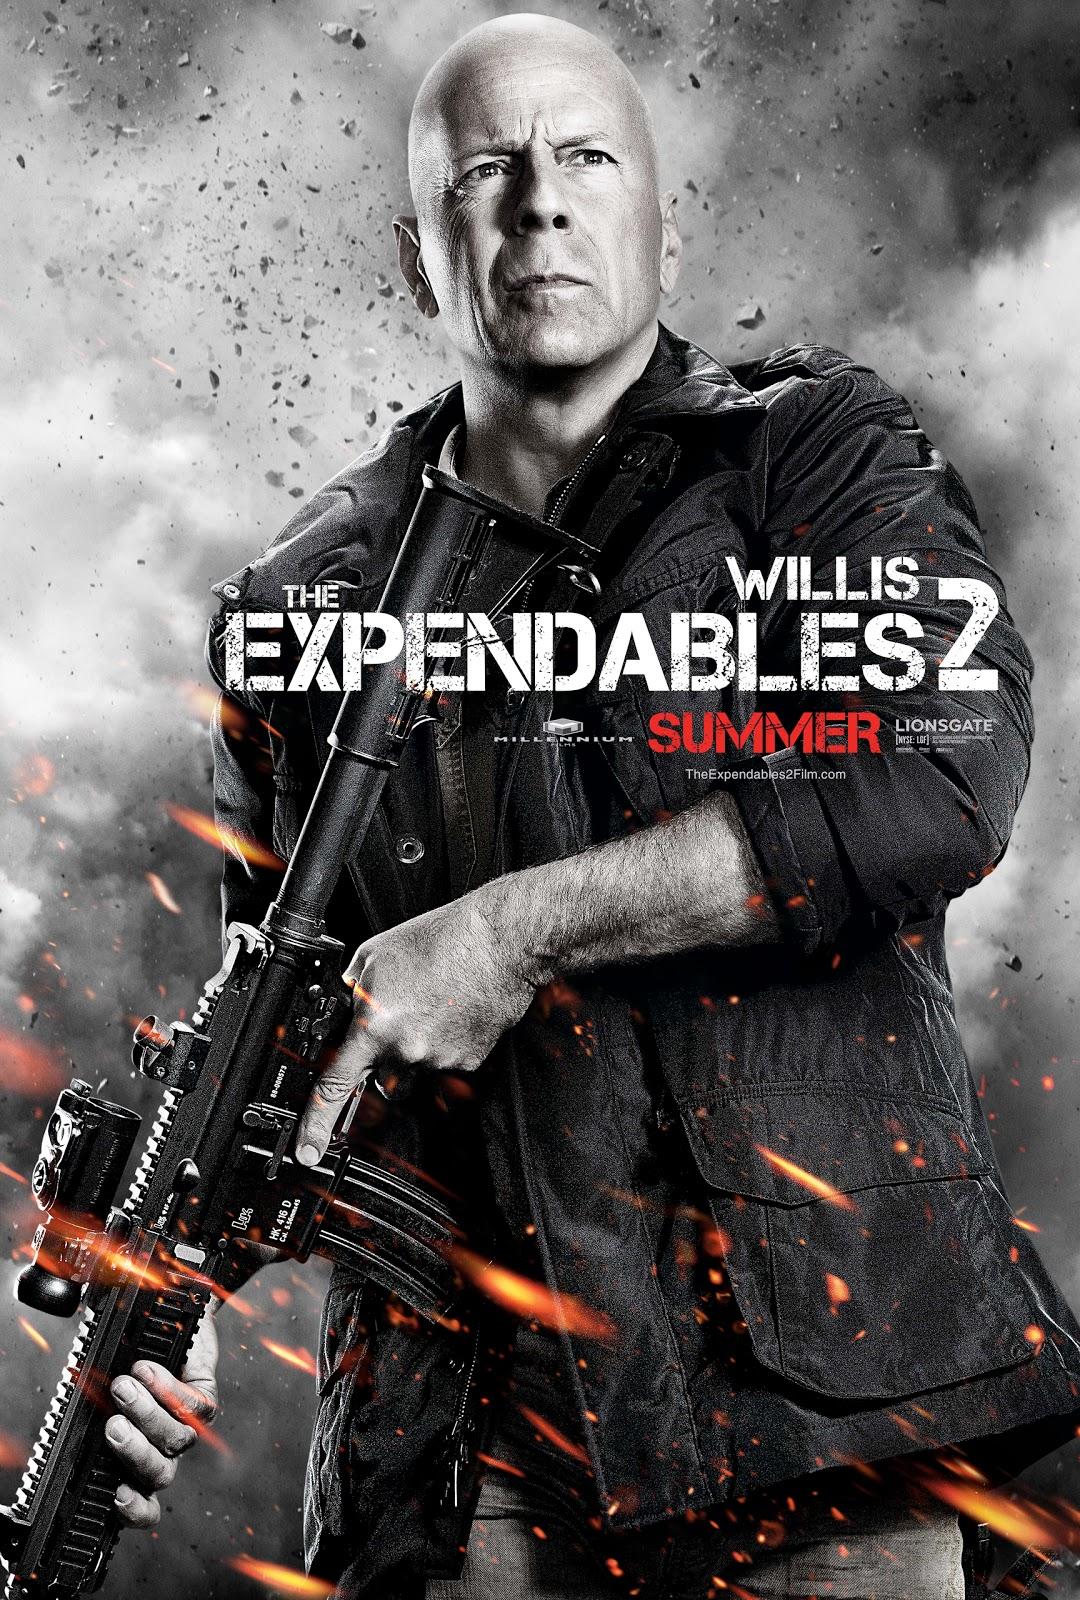 http://4.bp.blogspot.com/-M-zkhSZTo64/UC51TYF4bVI/AAAAAAAAErI/OCVjp_M27B4/s1600/expendables-2-movie-poster-bruce-willis.jpg